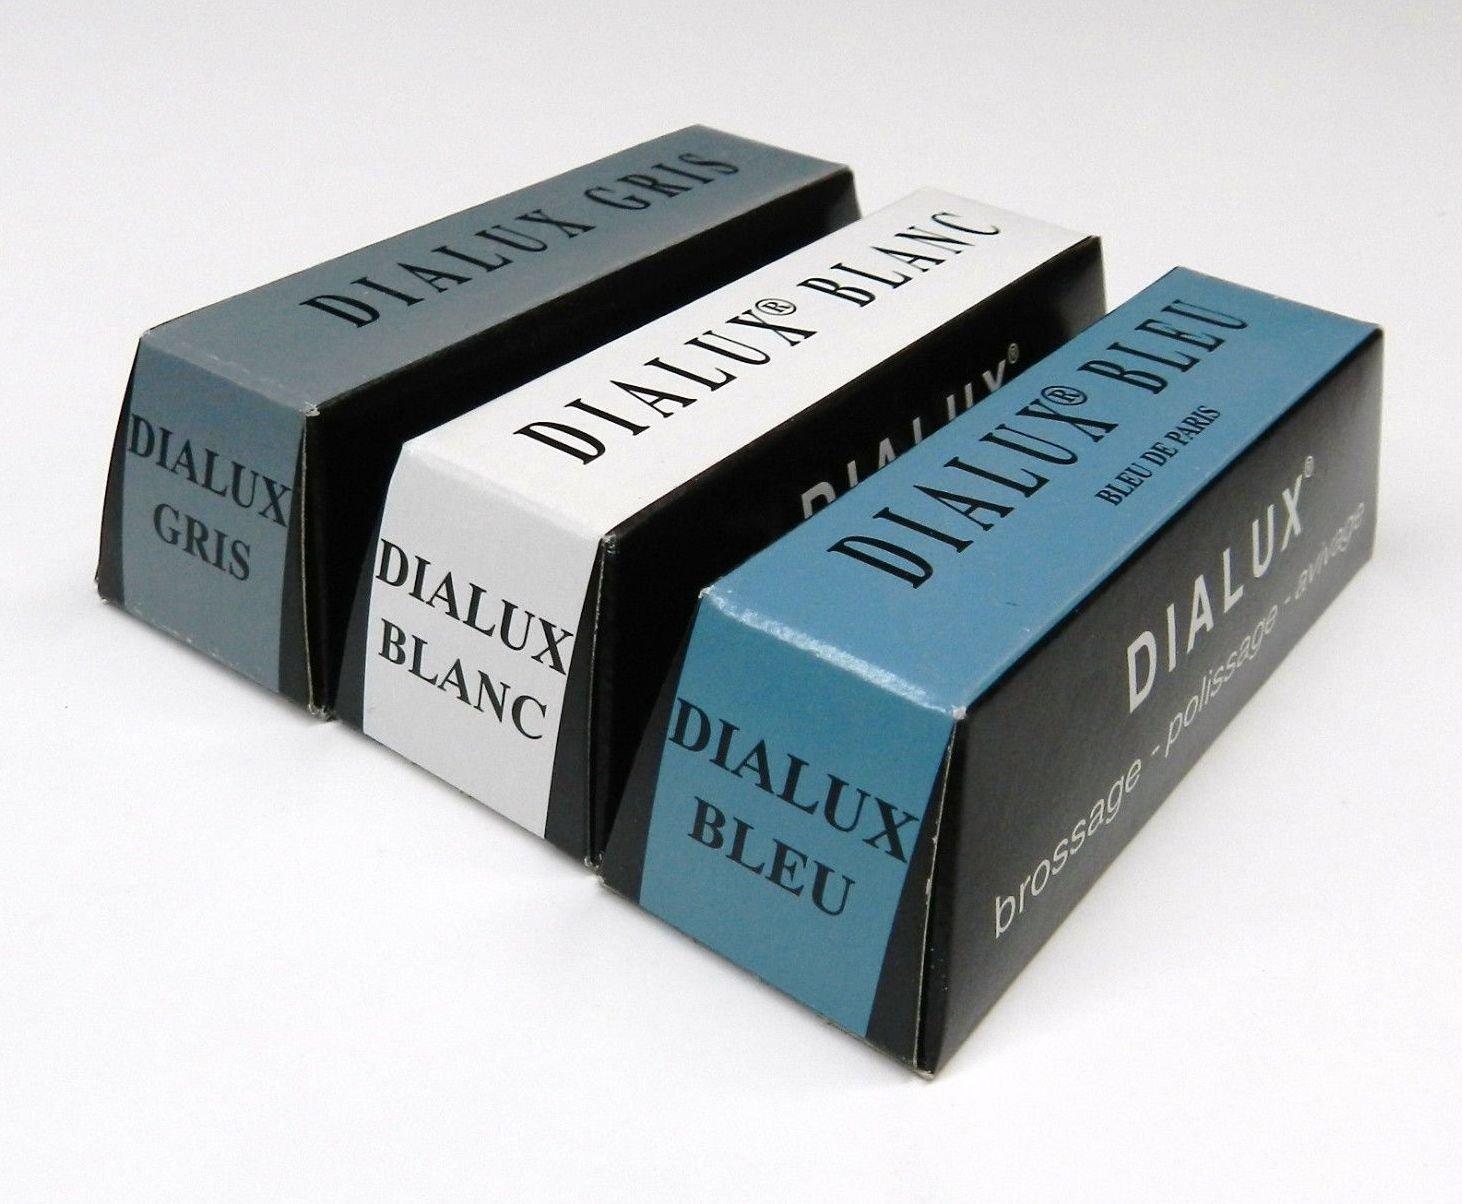 Dialux Metal Polishing Compound Grey, White and Blue 4oz 1/4b